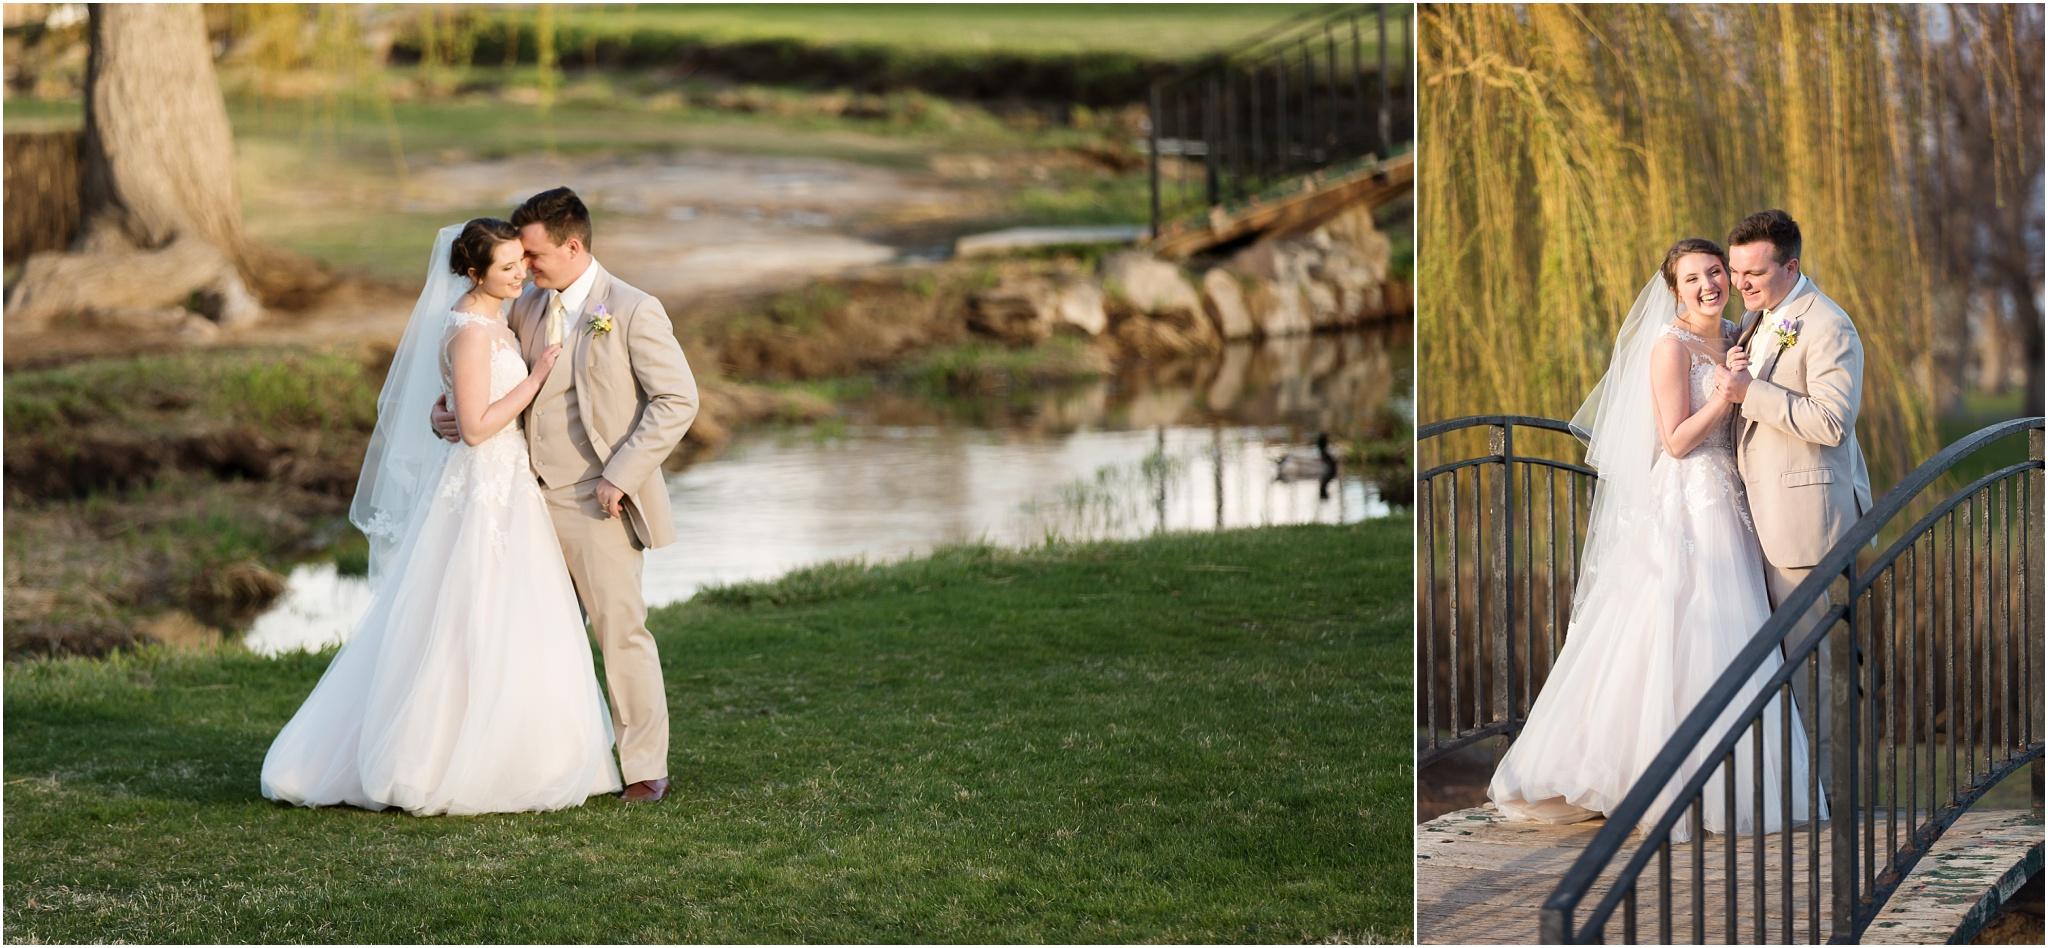 Wedding Photography_Meridian Idaho_Nampa Idaho_Leah Southwick Photography_0072.jpg